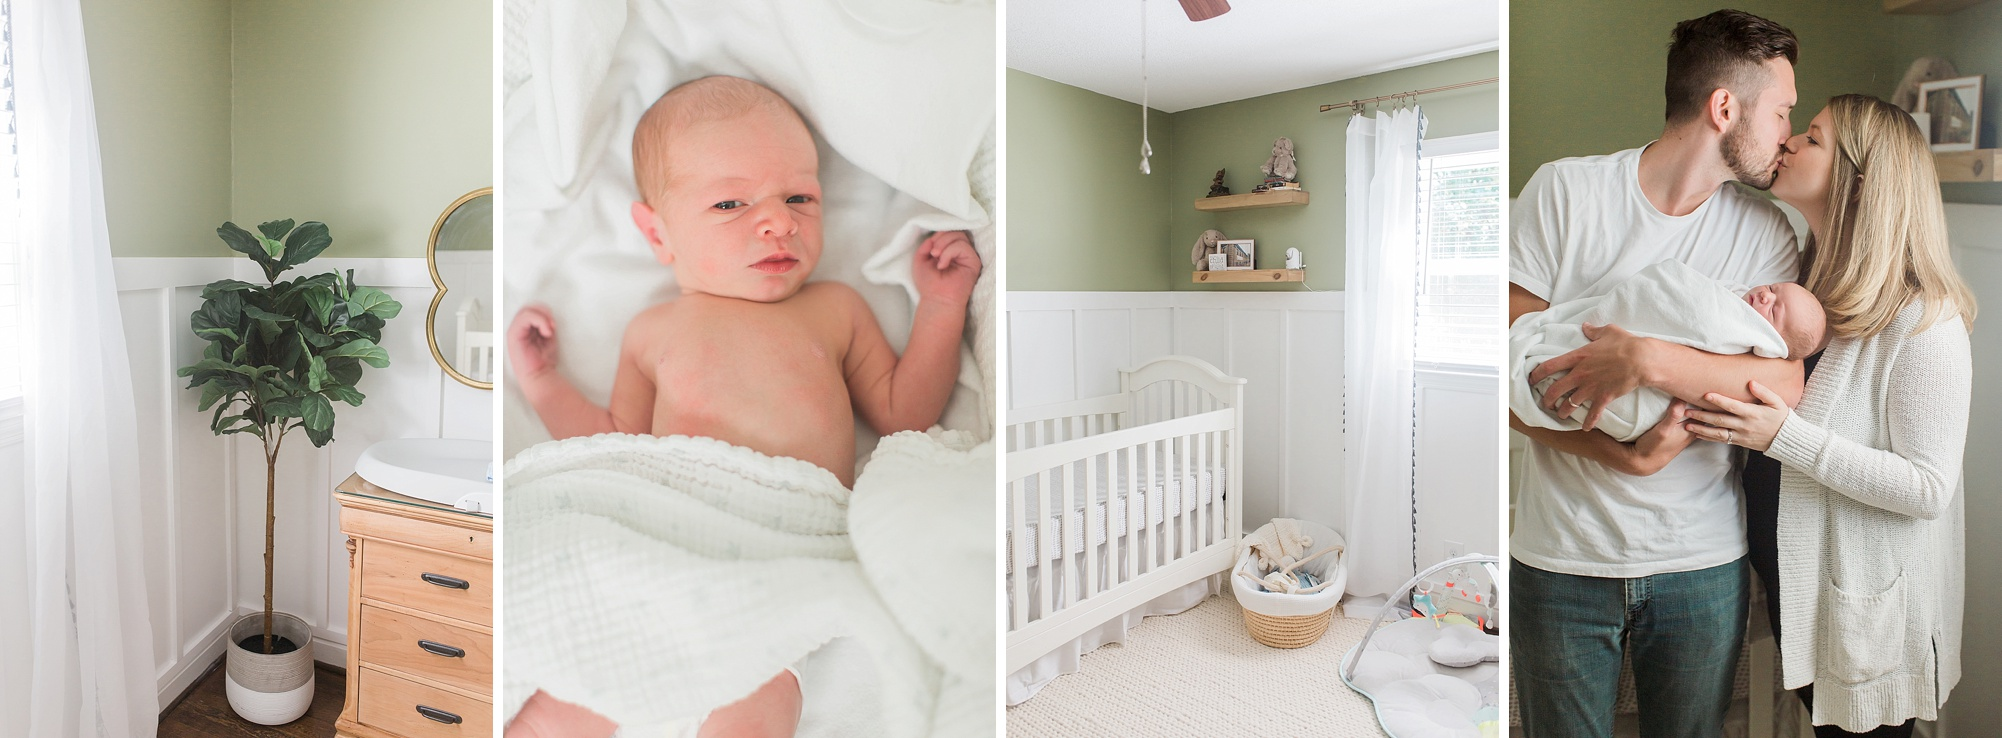 Lifestyle newborn photographer Winston-Salem NC